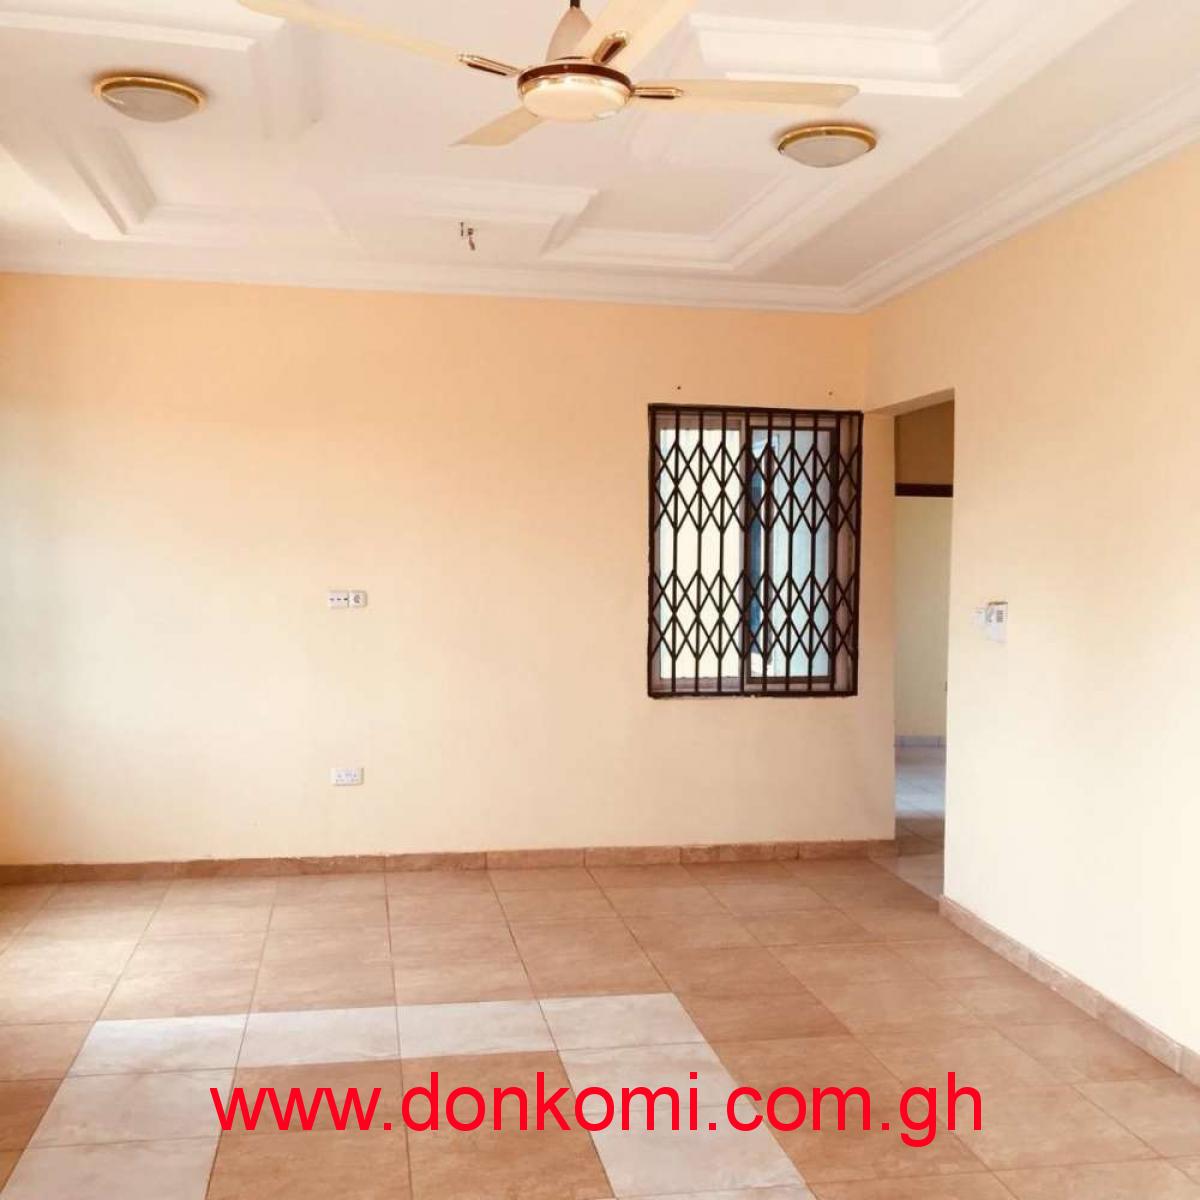 2 bedrooms Tema close to dps